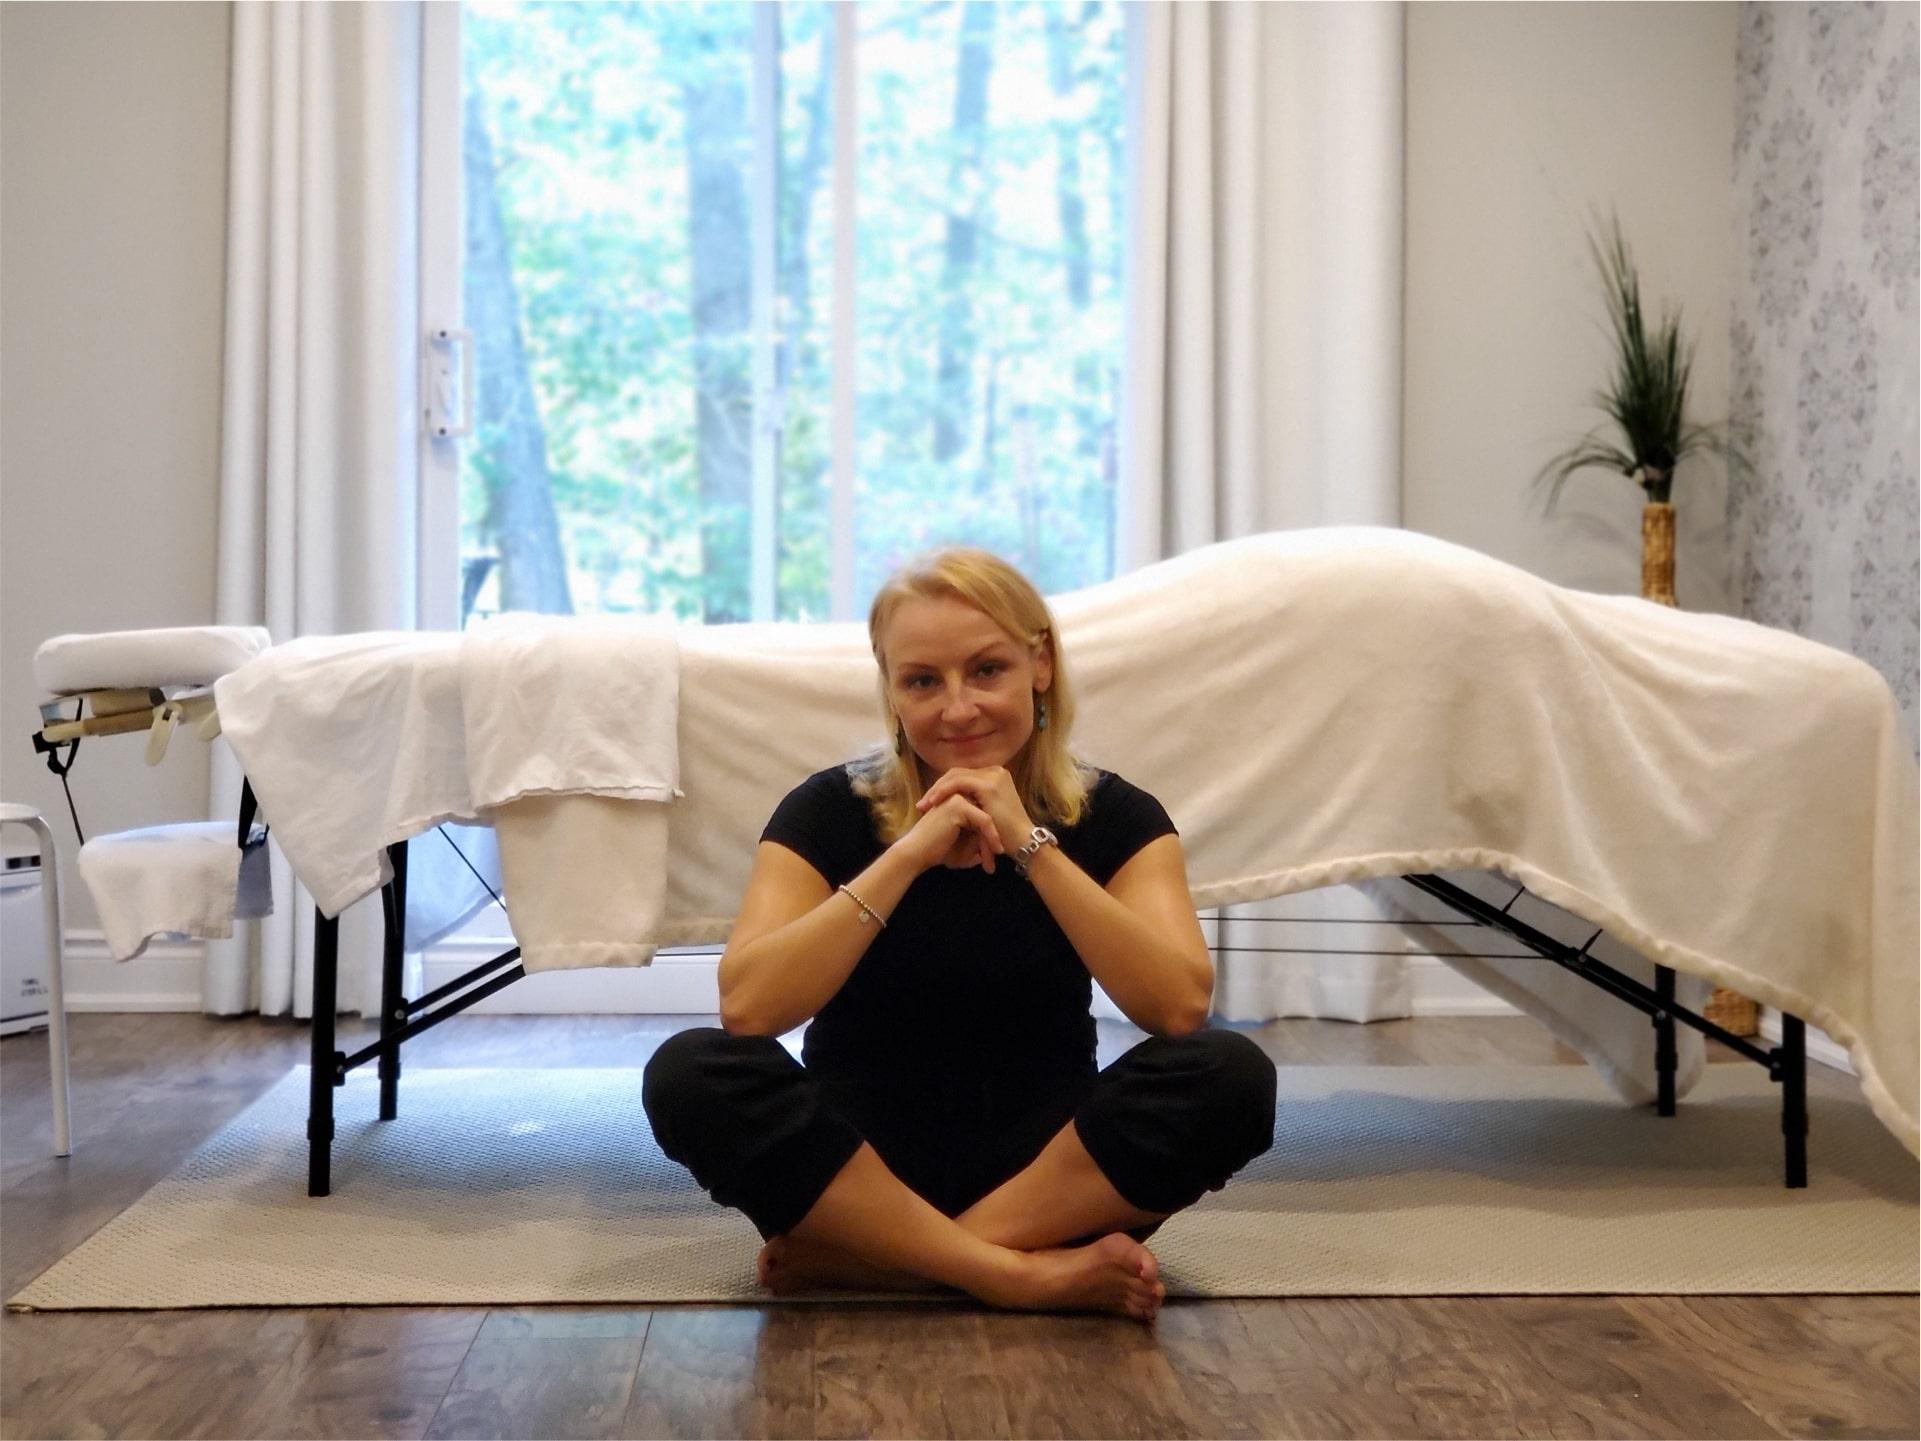 Toronto Massage Therapist | Services & Rates